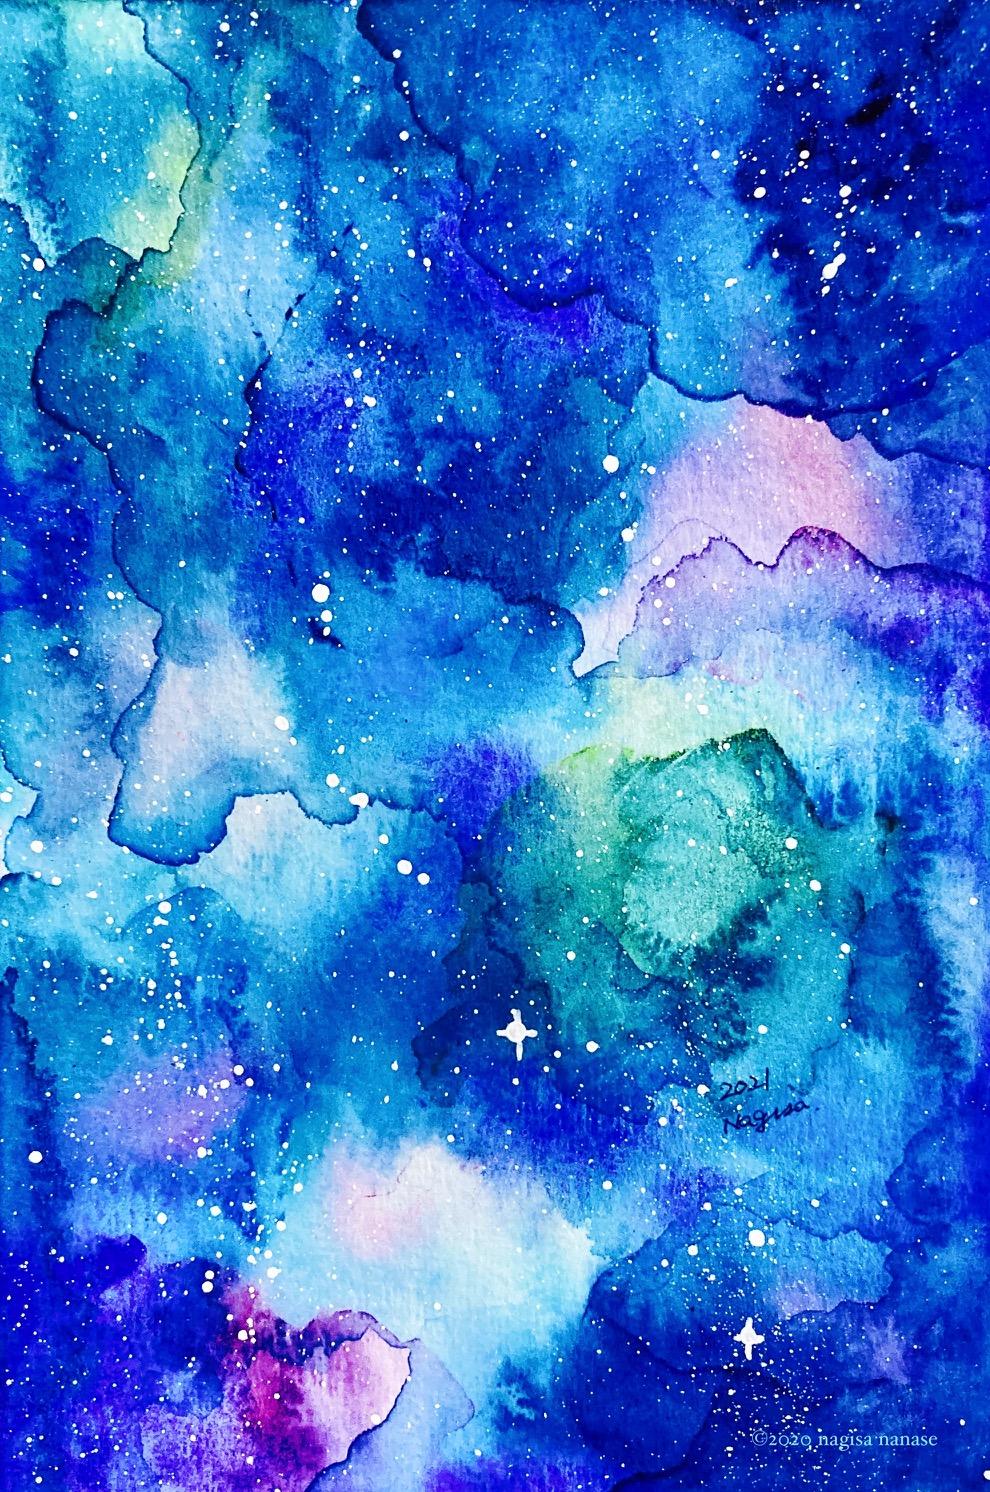 Planets melodyの表紙